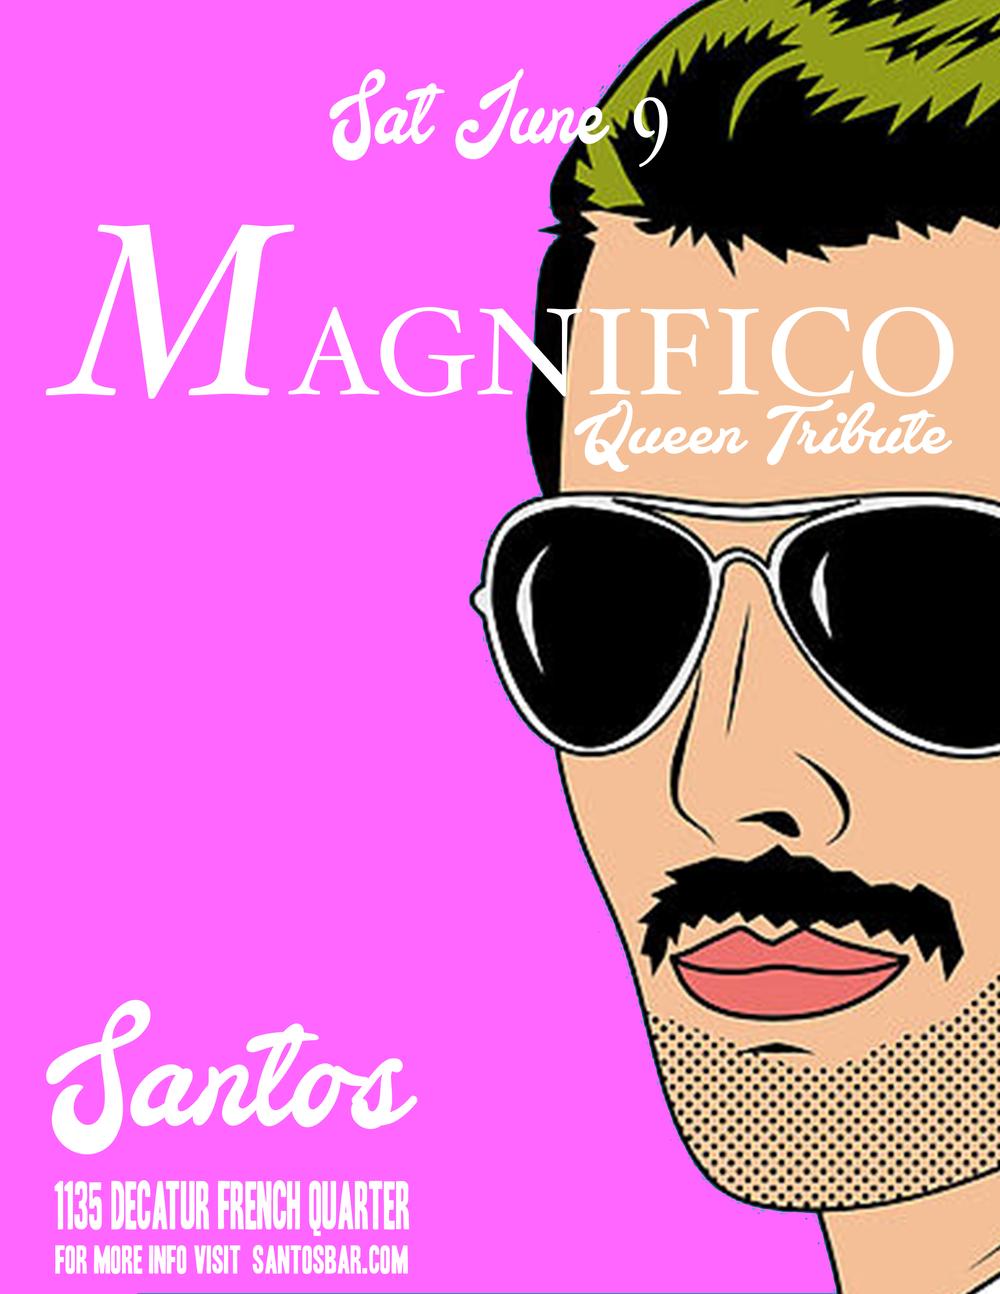 magnifico 6_9 copy.png